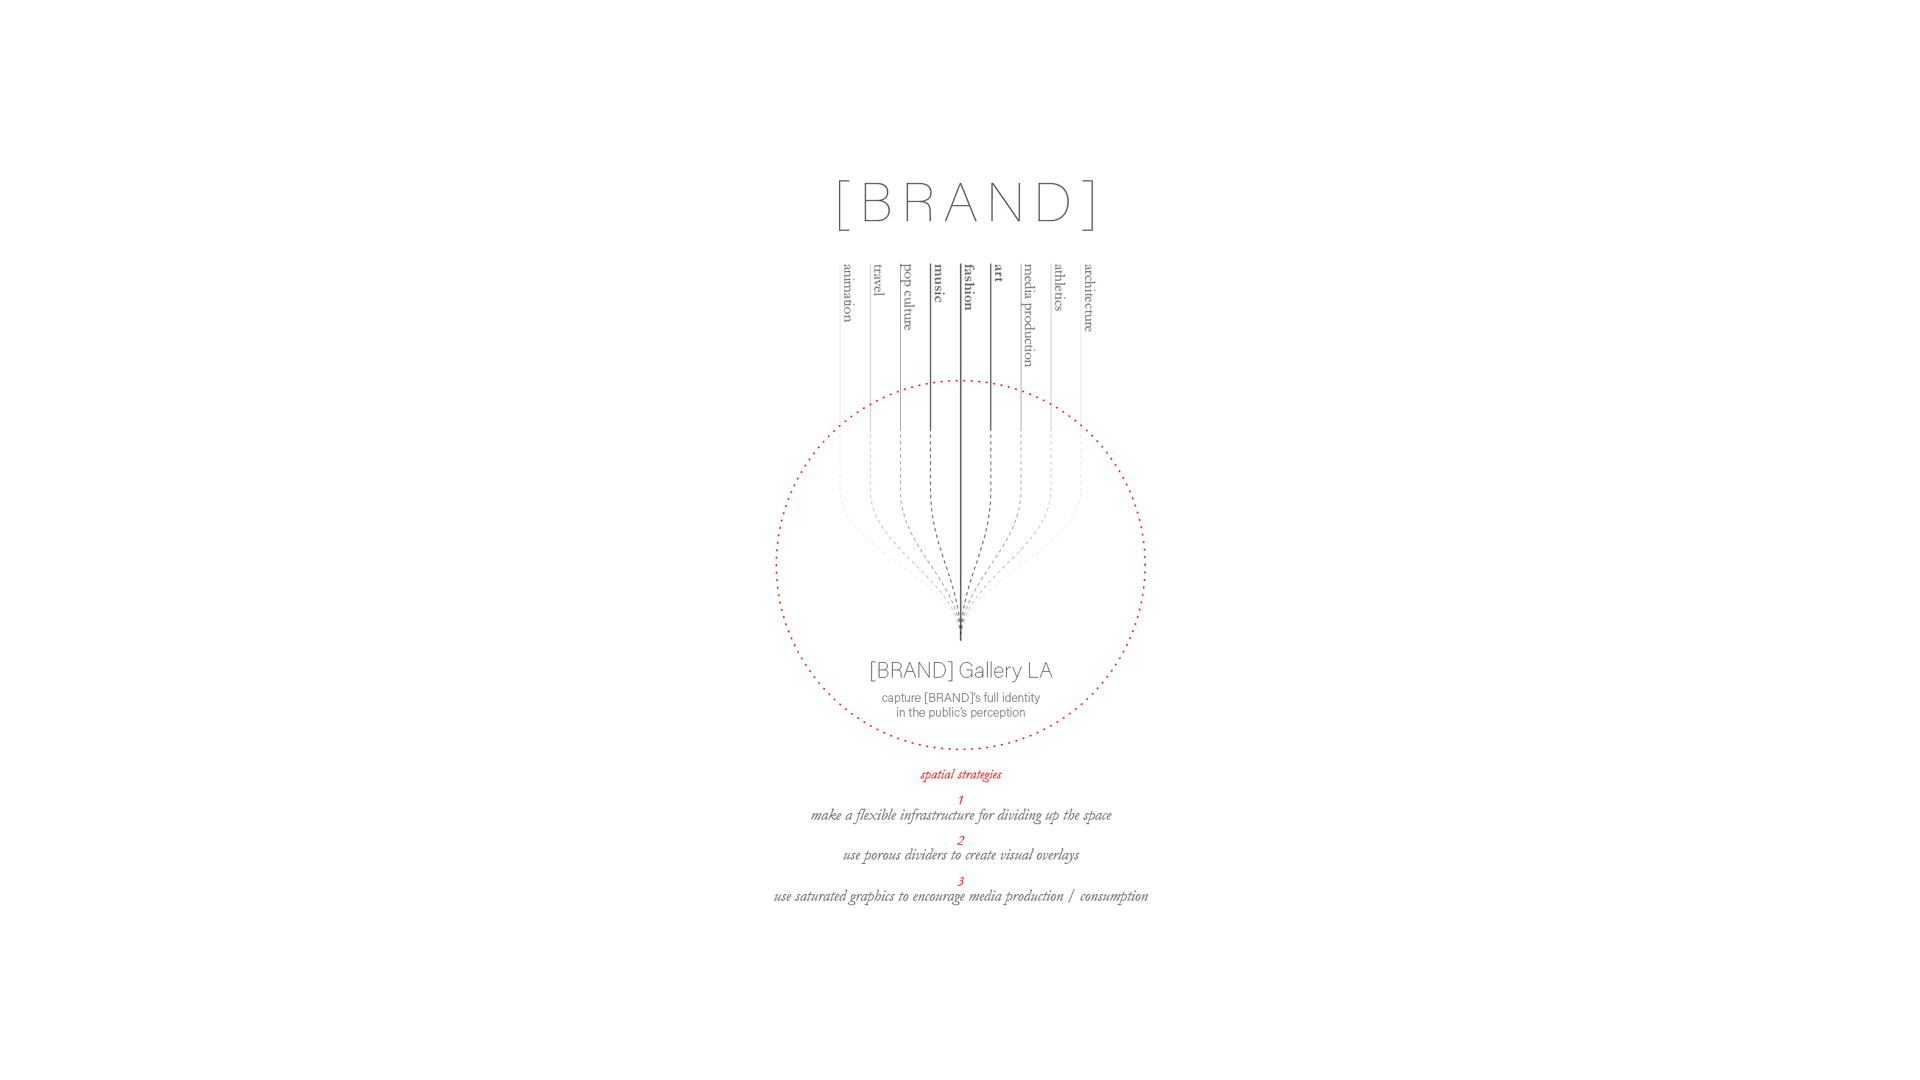 Brand gallery - 03.jpg